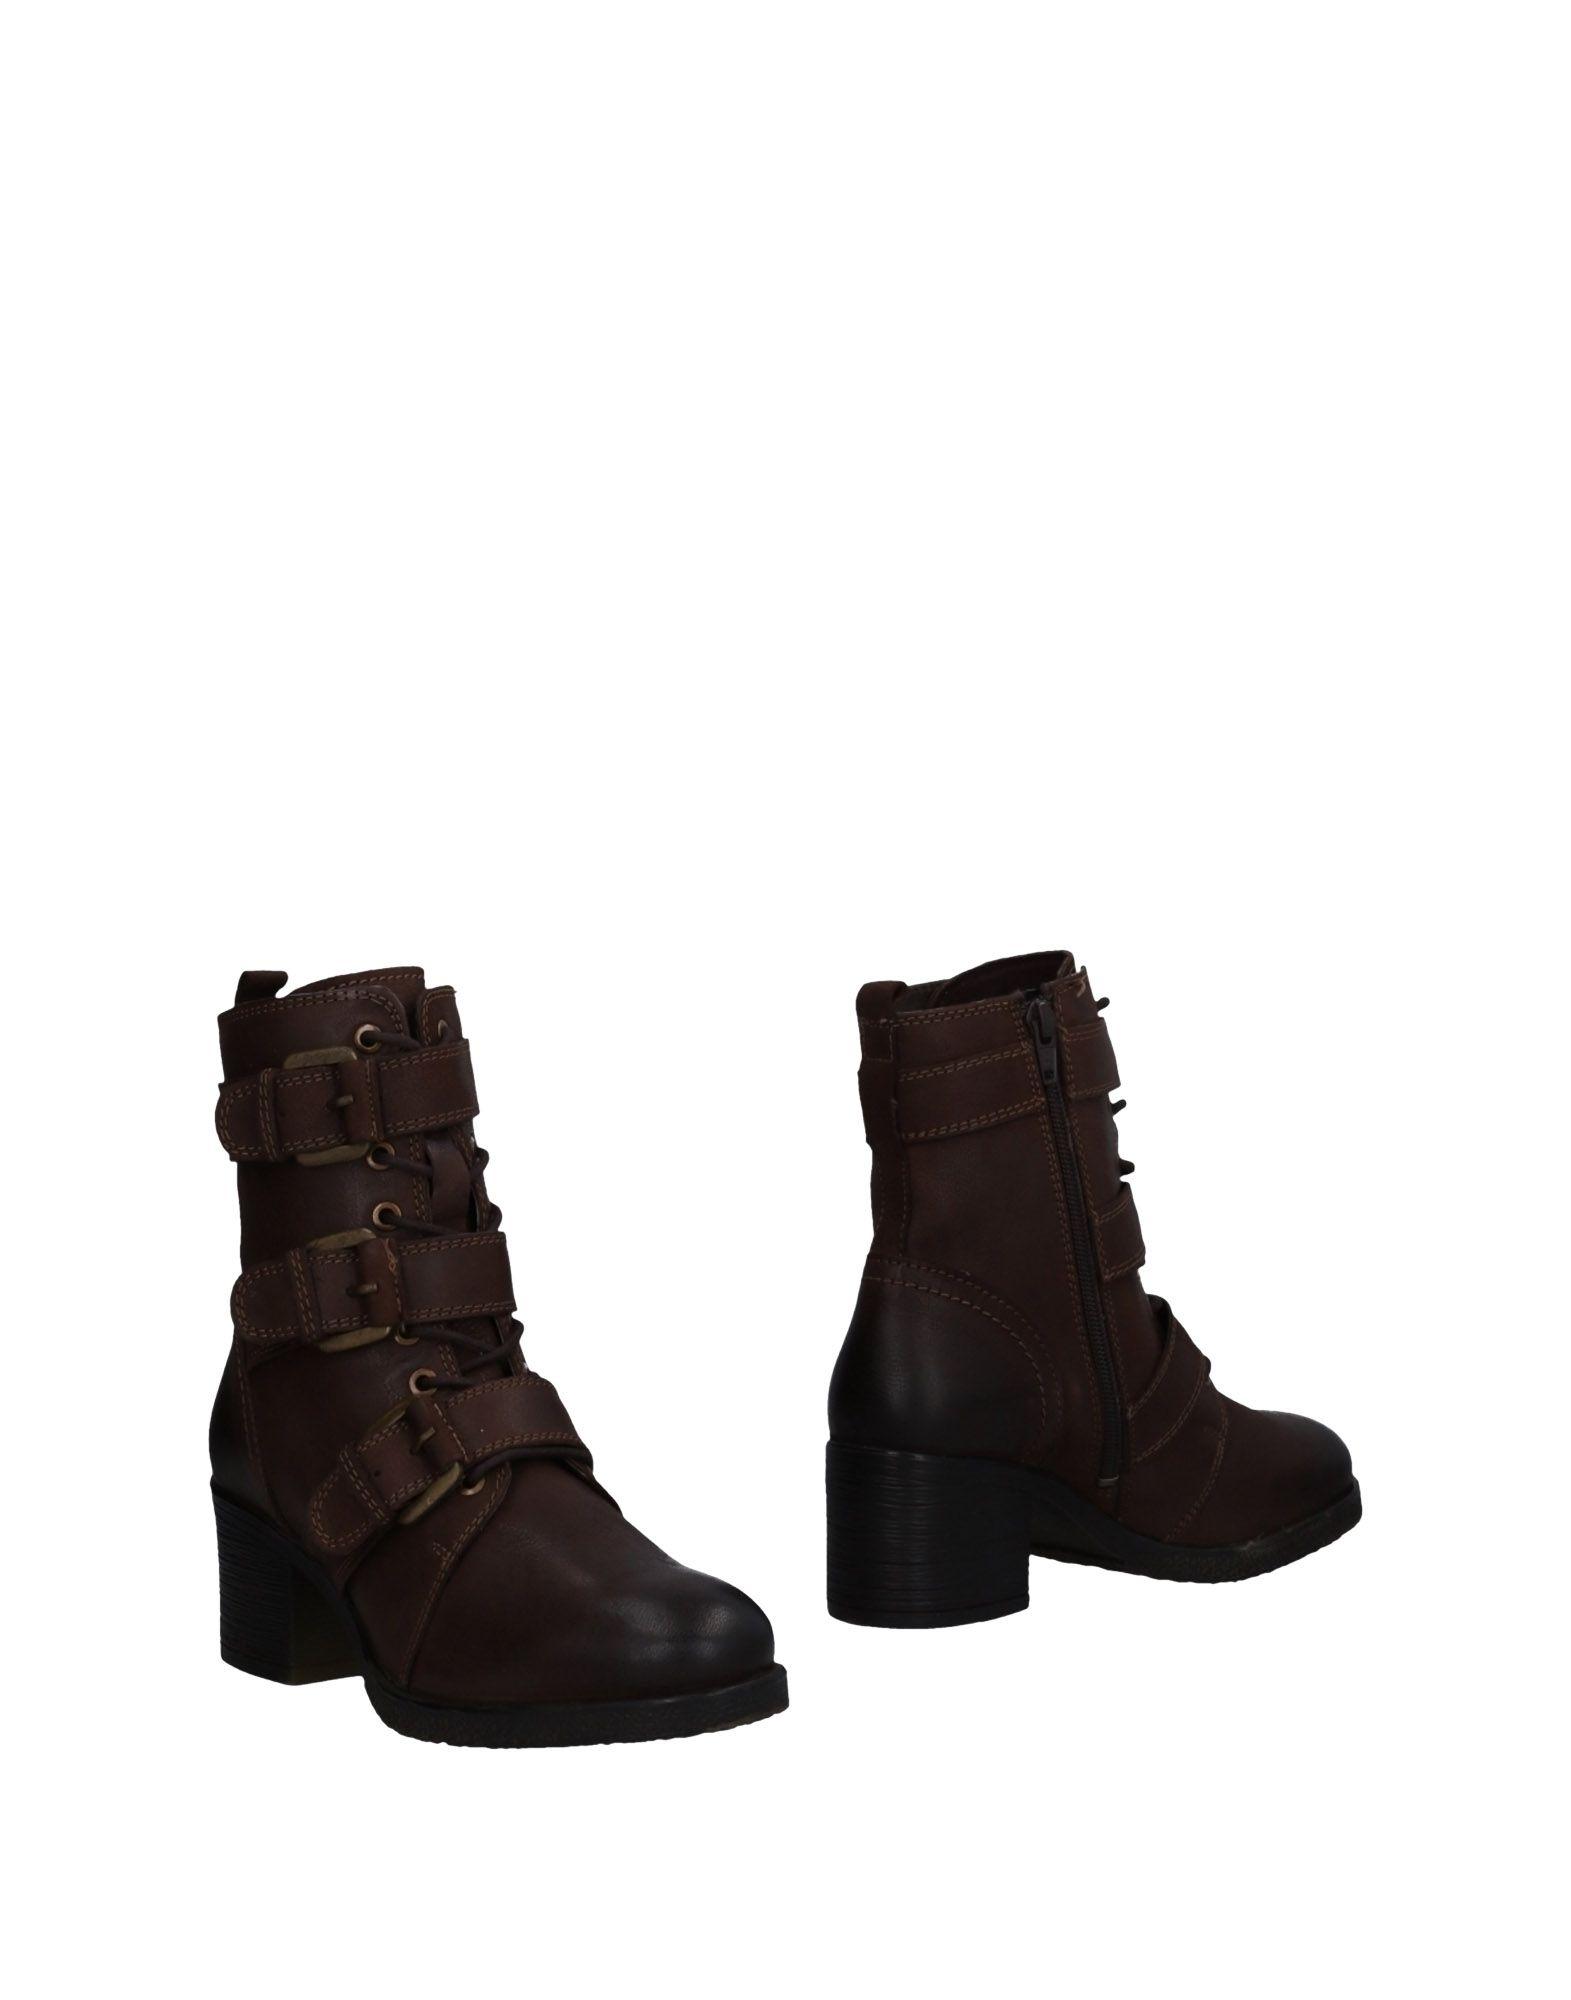 Bottine Carmela Femme - Bottines Carmela Moka hommes Dernières chaussures discount pour hommes Moka et femmes fda17d